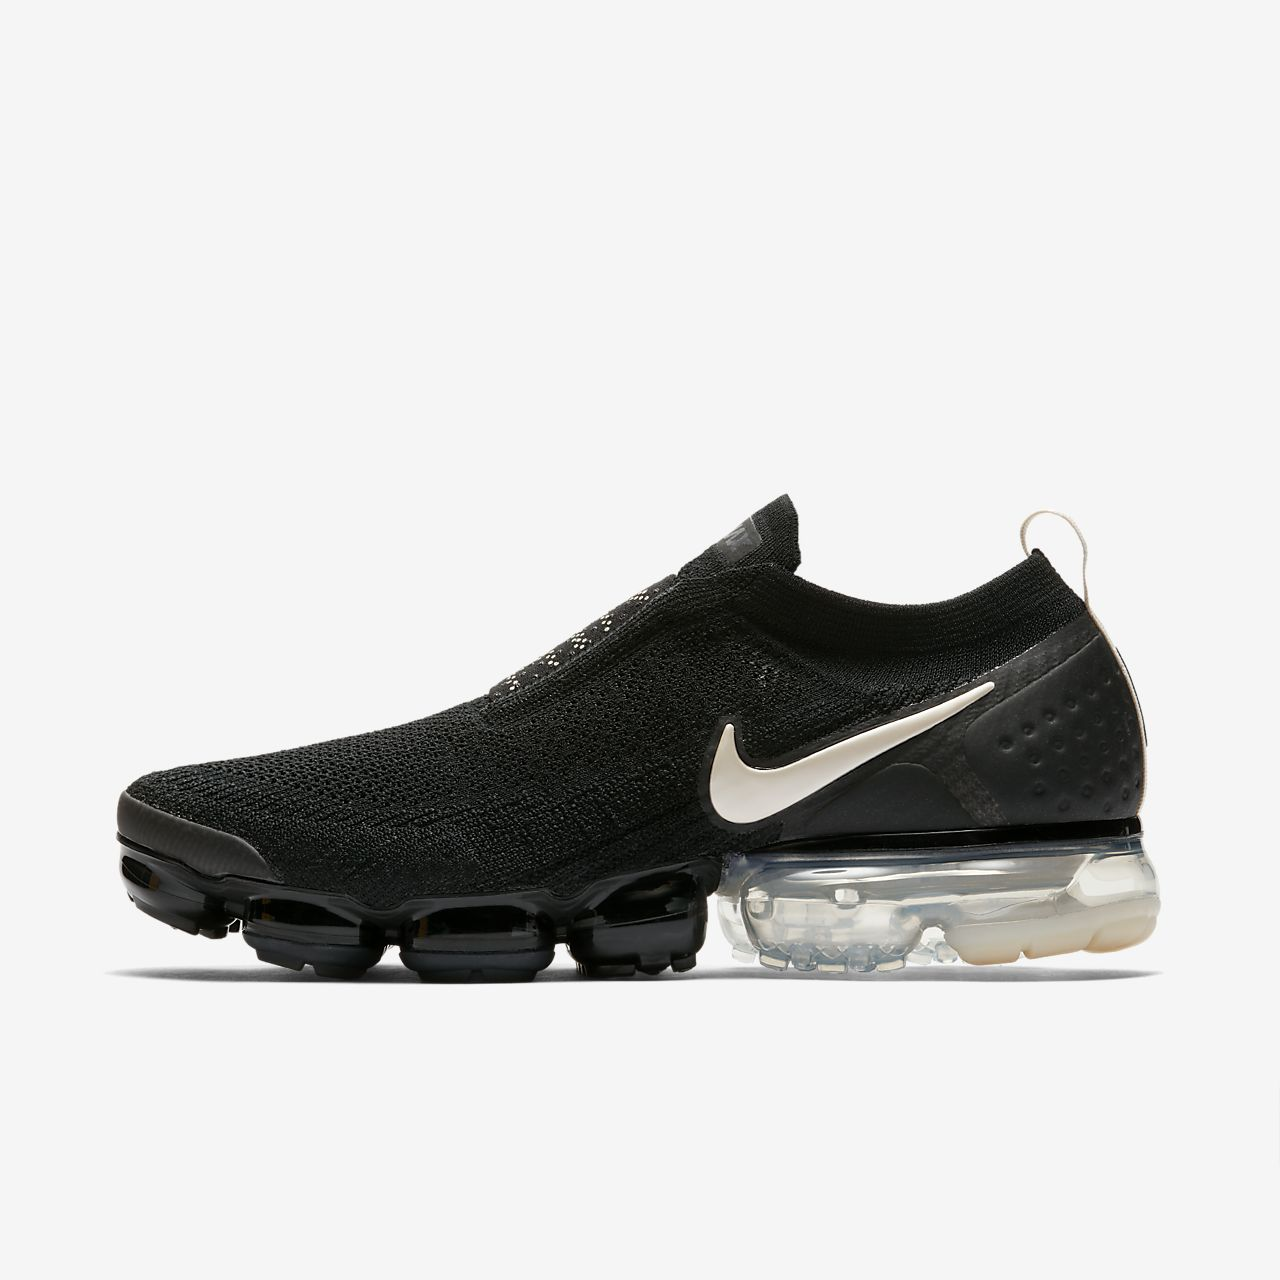 pretty nice 83a40 02772 Nike Air VaporMax Flyknit Moc 2 Shoe